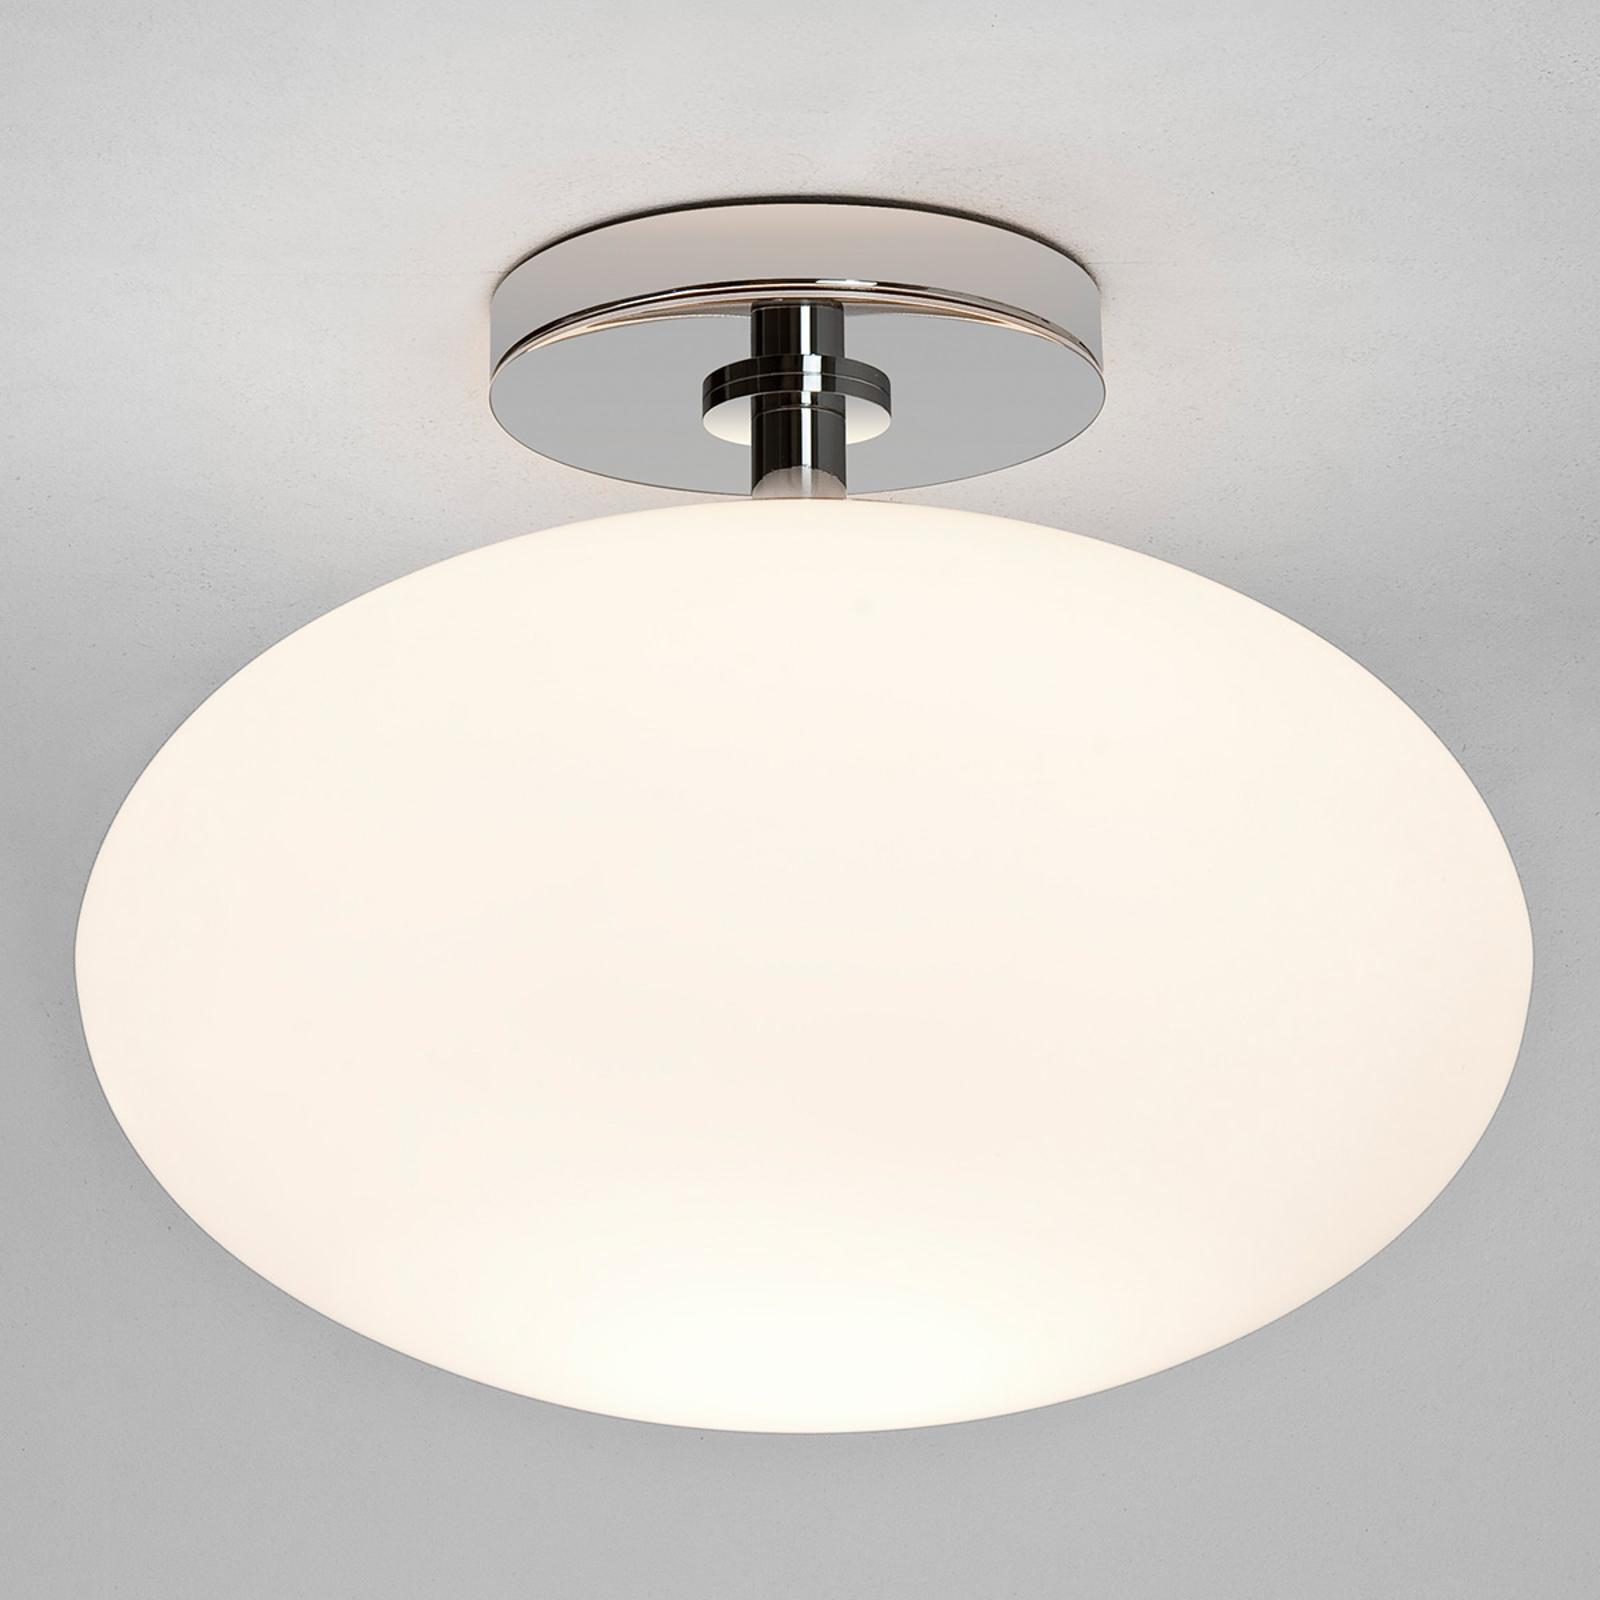 Lámpara de techo para baño Zeppo ovalada, IP44